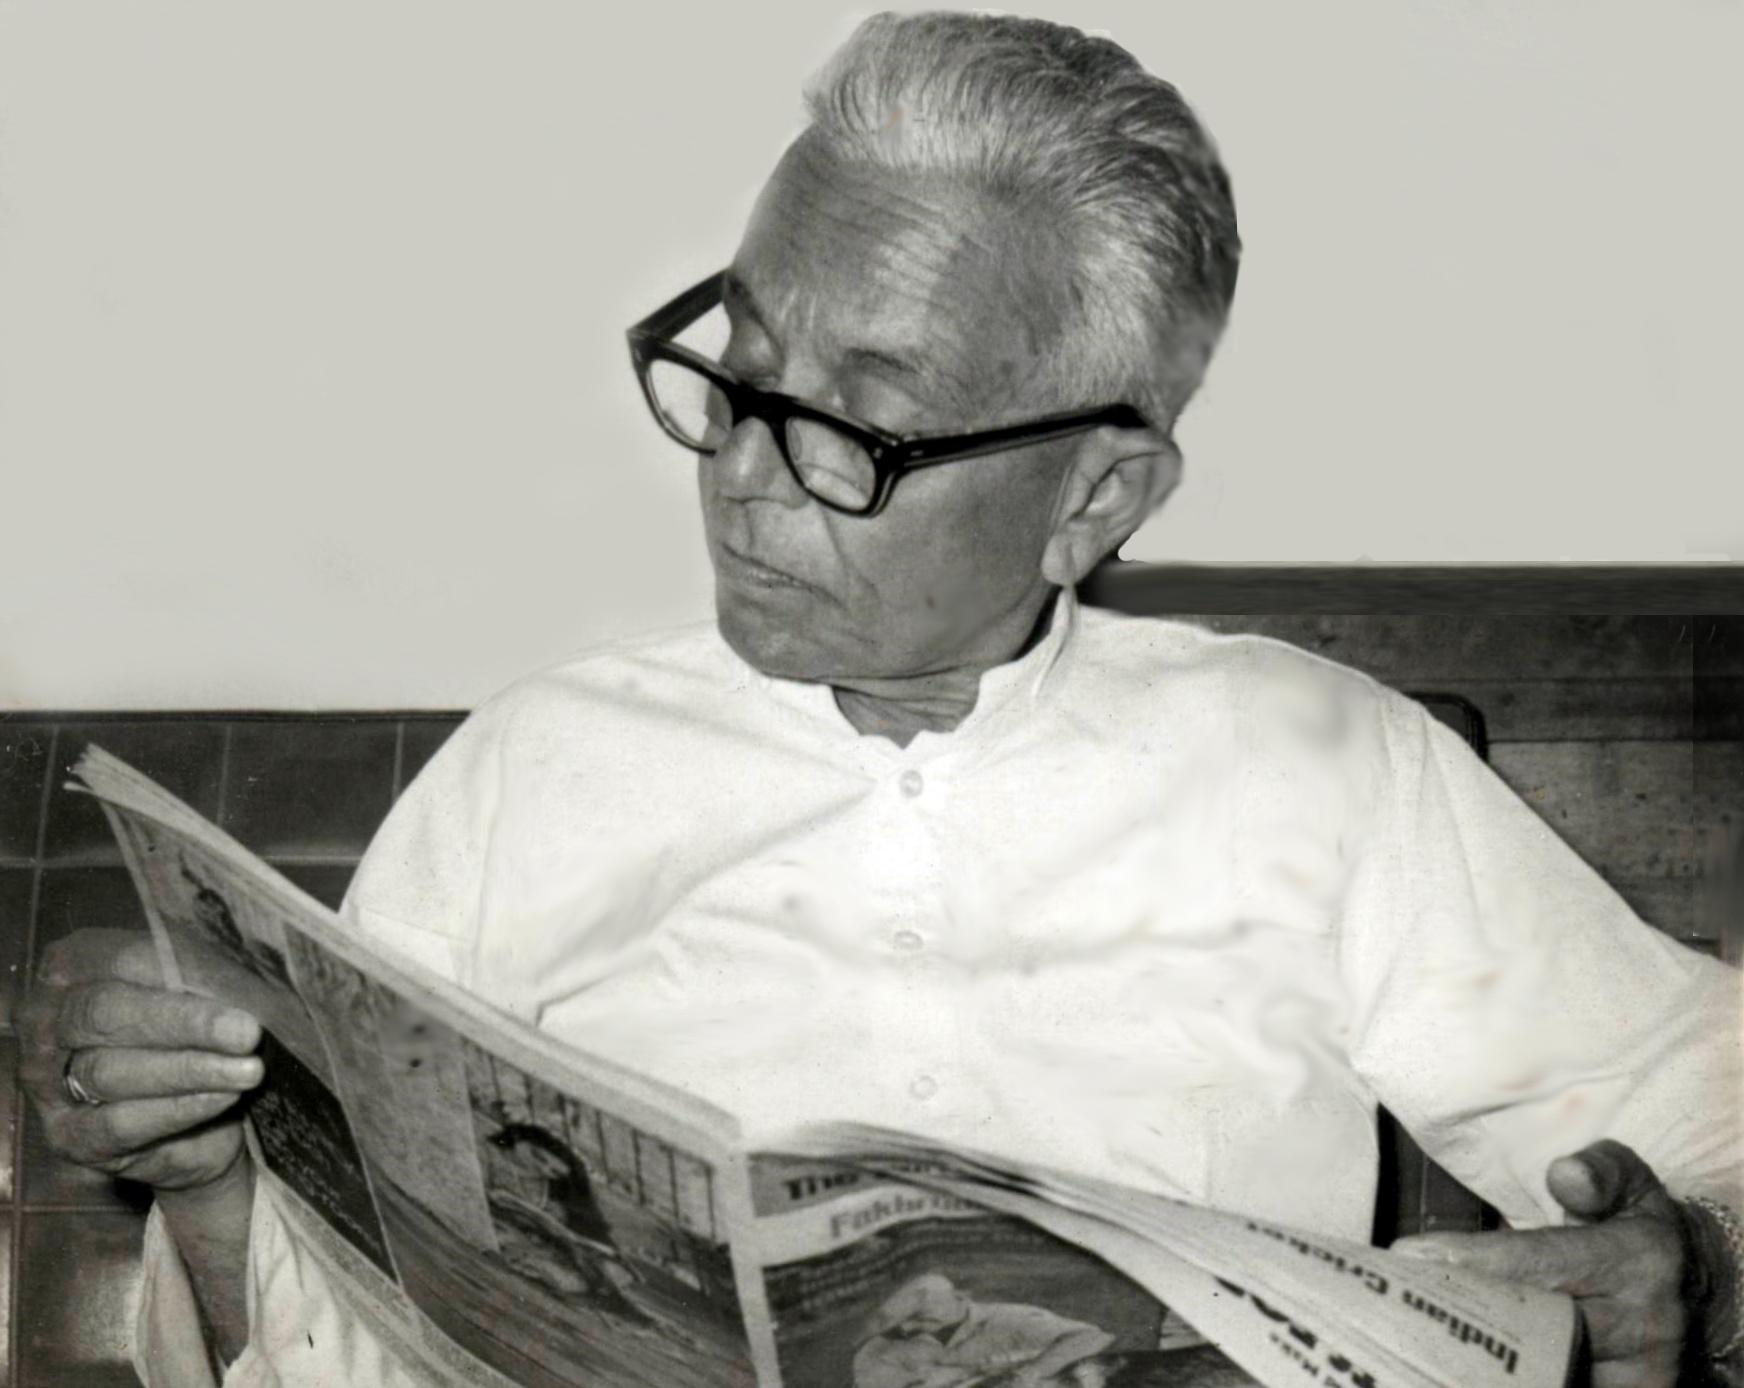 Maa Naa Chowdappa